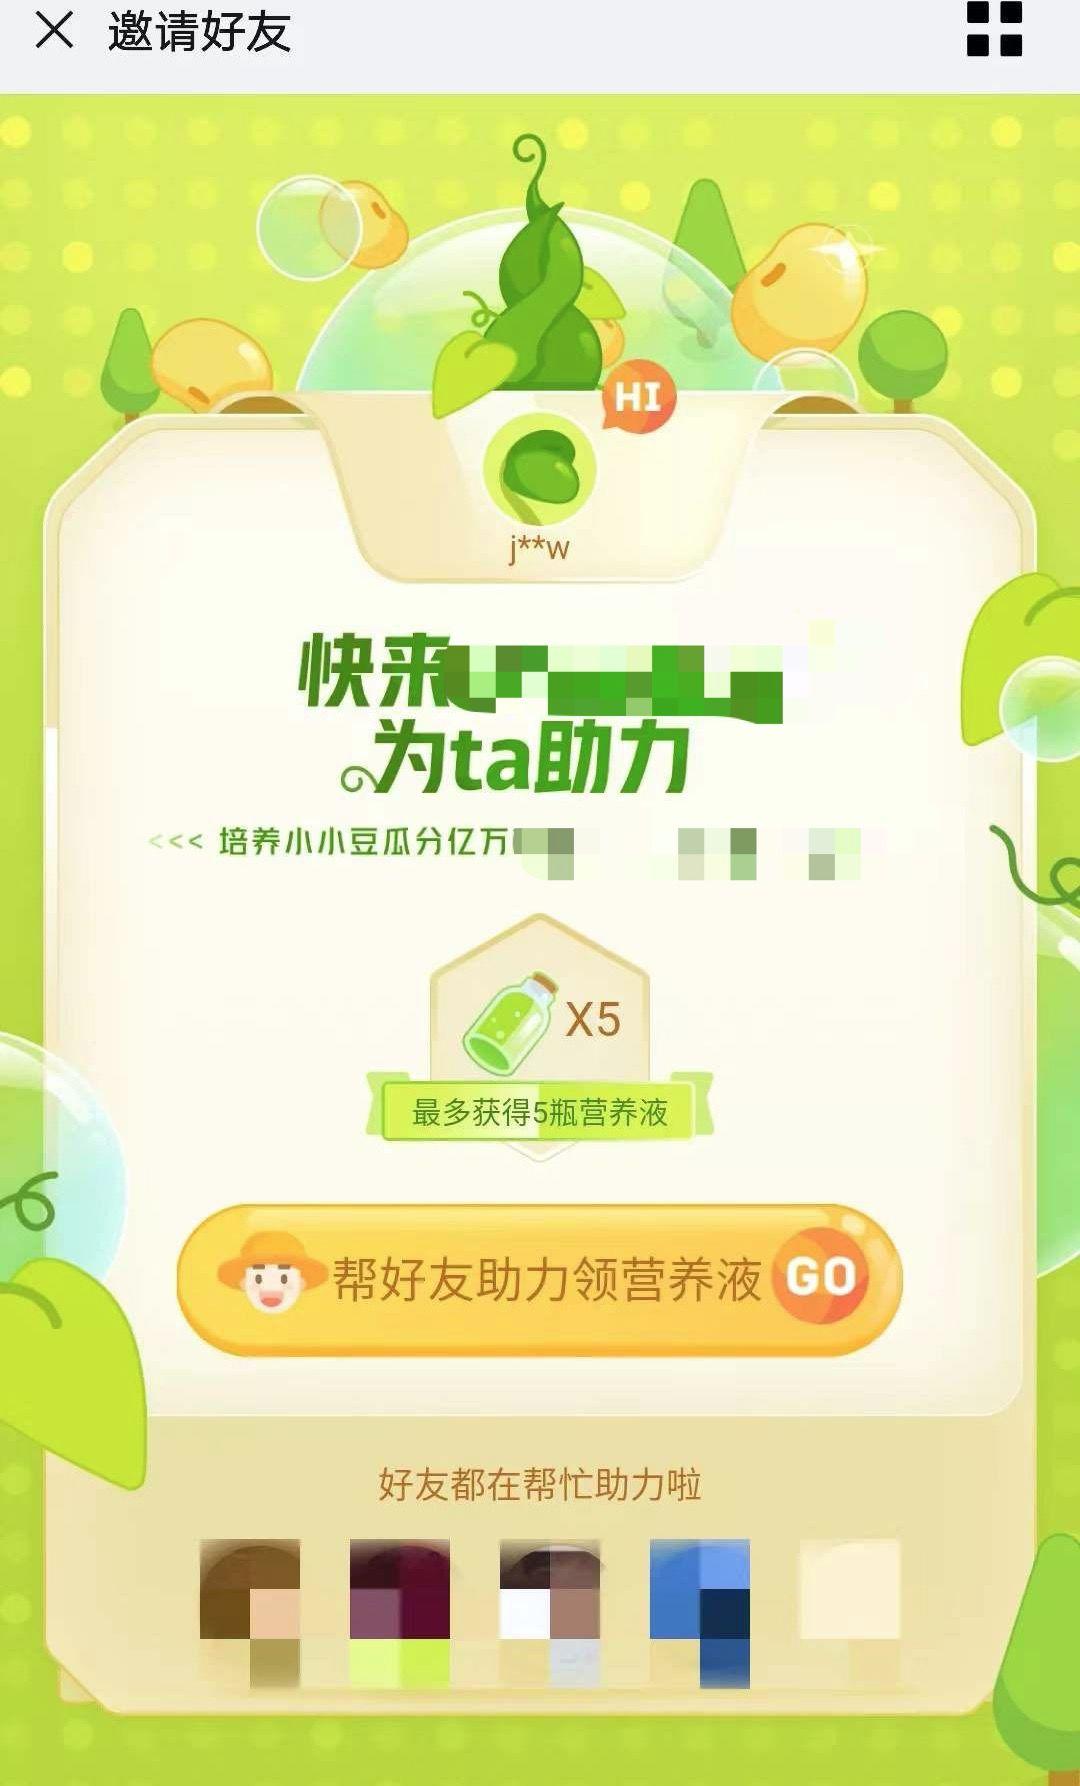 mg赌场手机版网址,湖南国电总经理刘定军:去产能应力求精准 建立全国统一标准